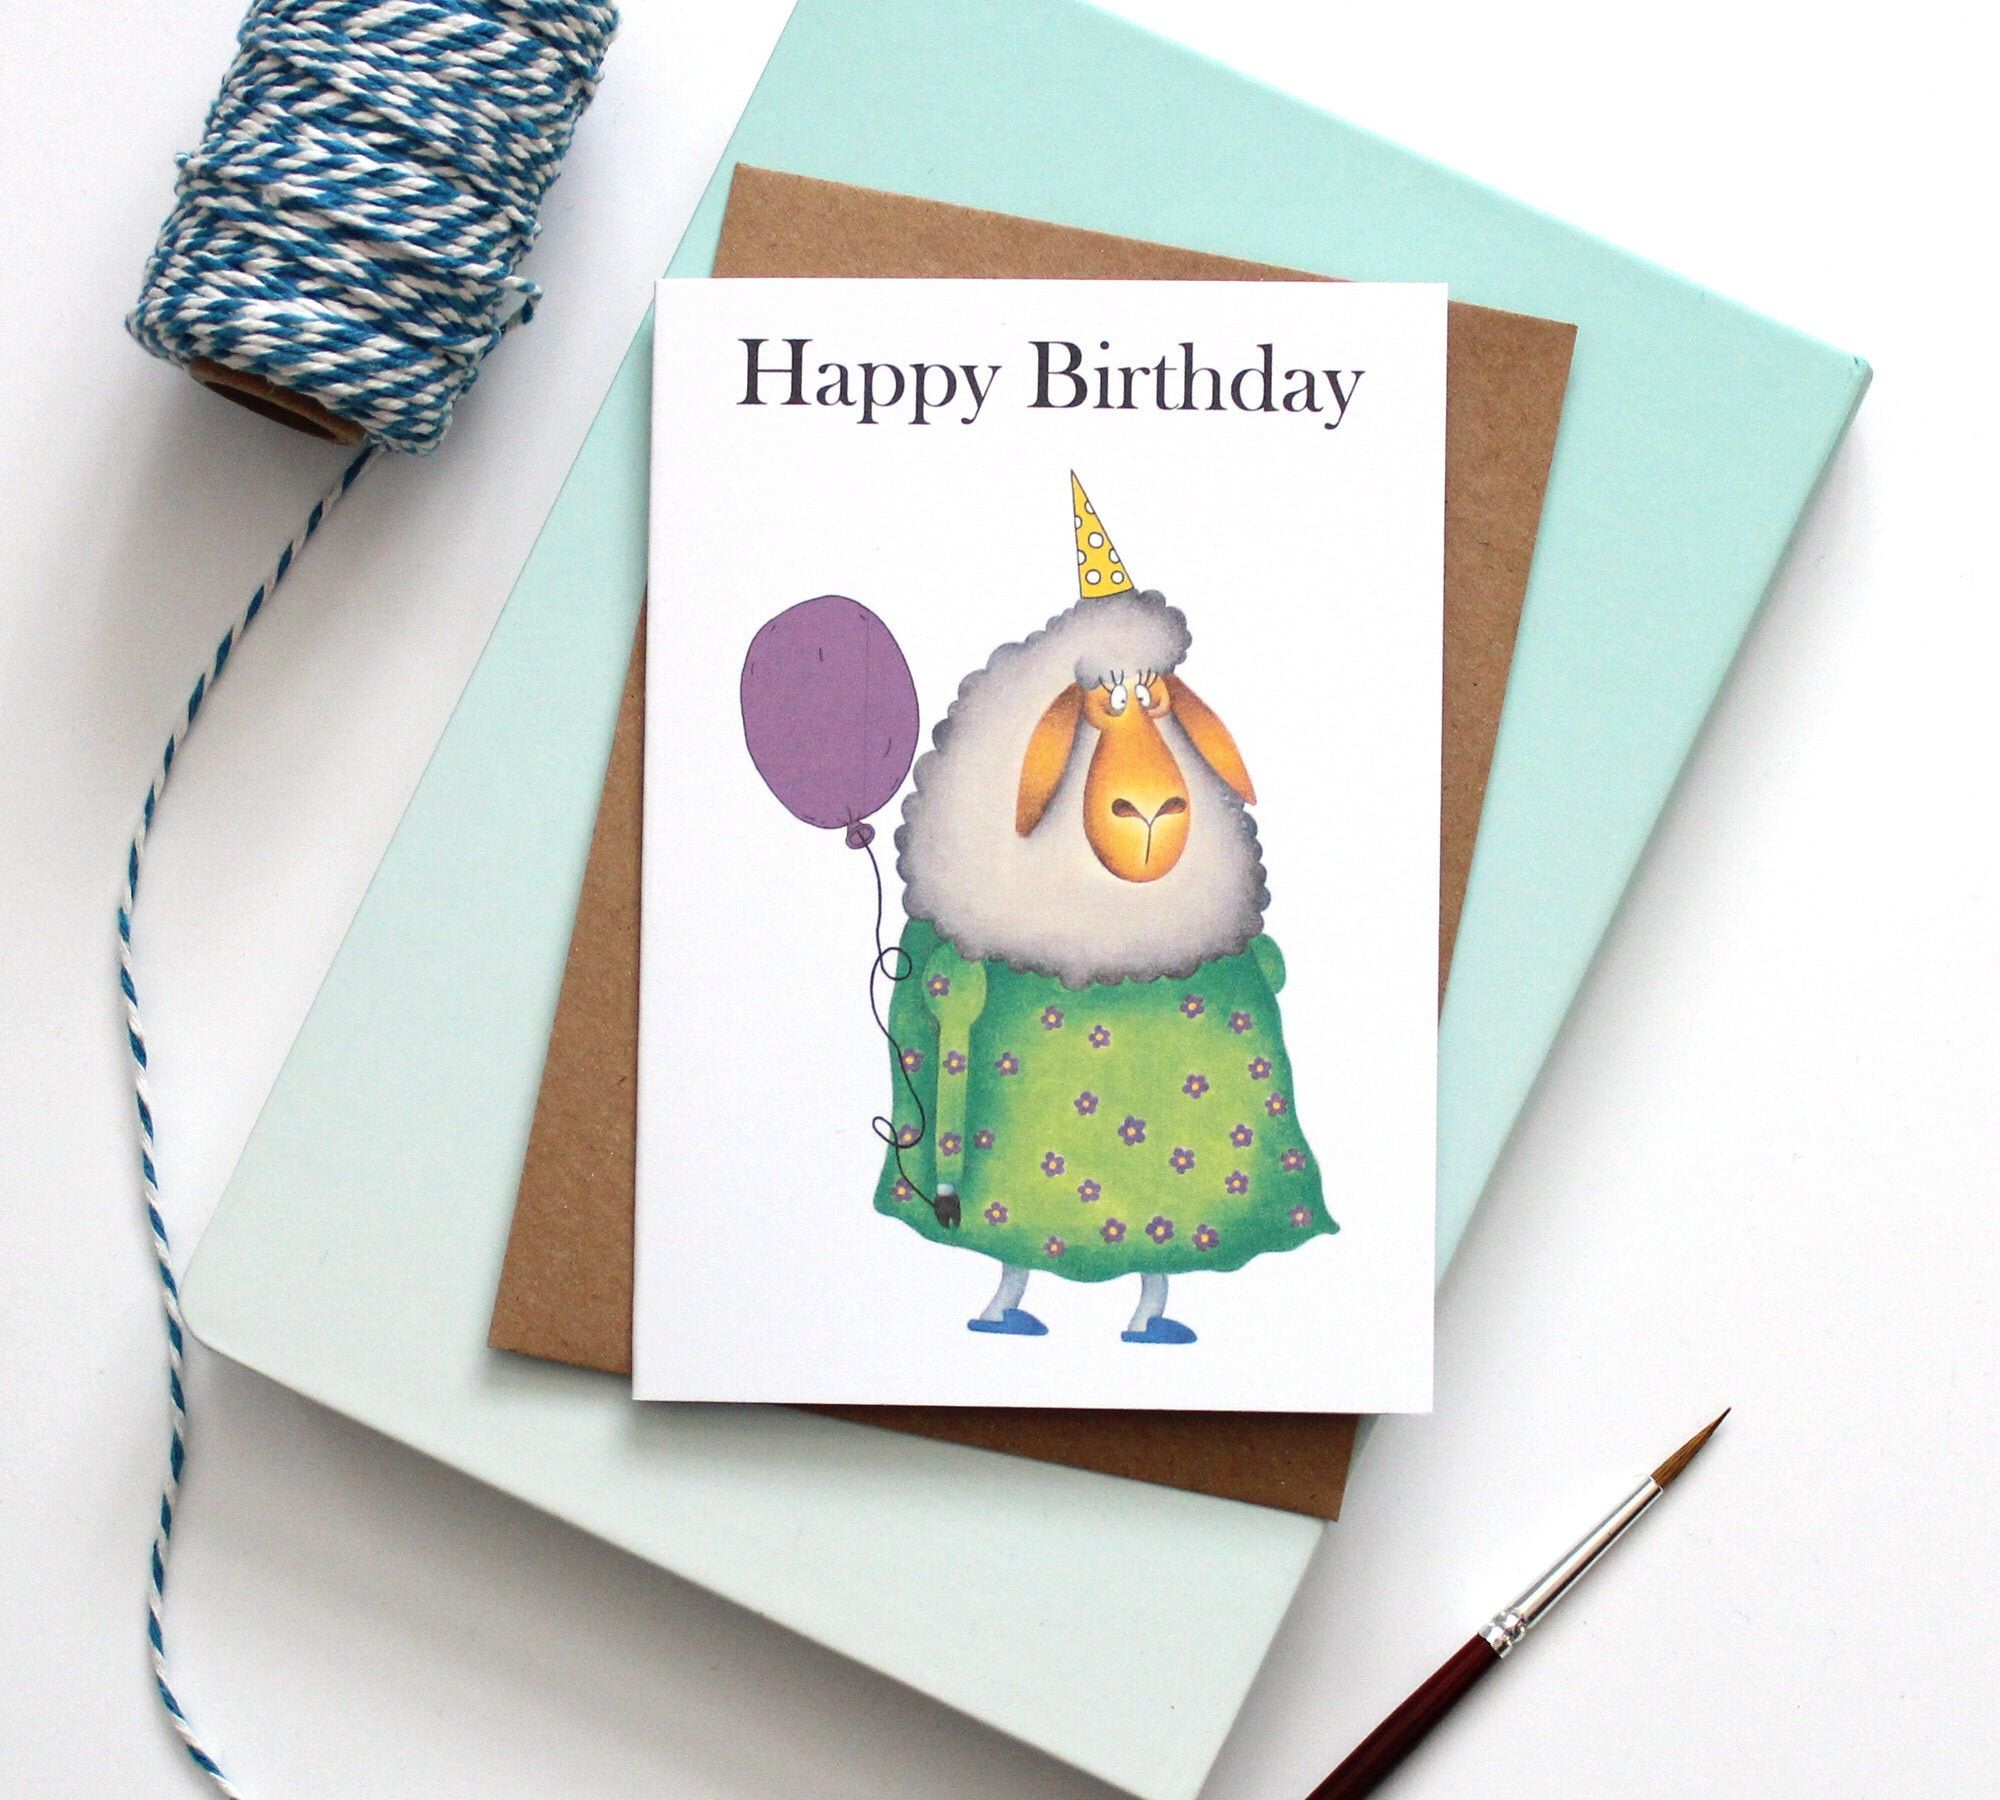 Happy Birthday Greeting Card Birthday Card Note Card Etsy Birthday Greeting Cards Happy Birthday Greeting Card Happy Birthday Greetings